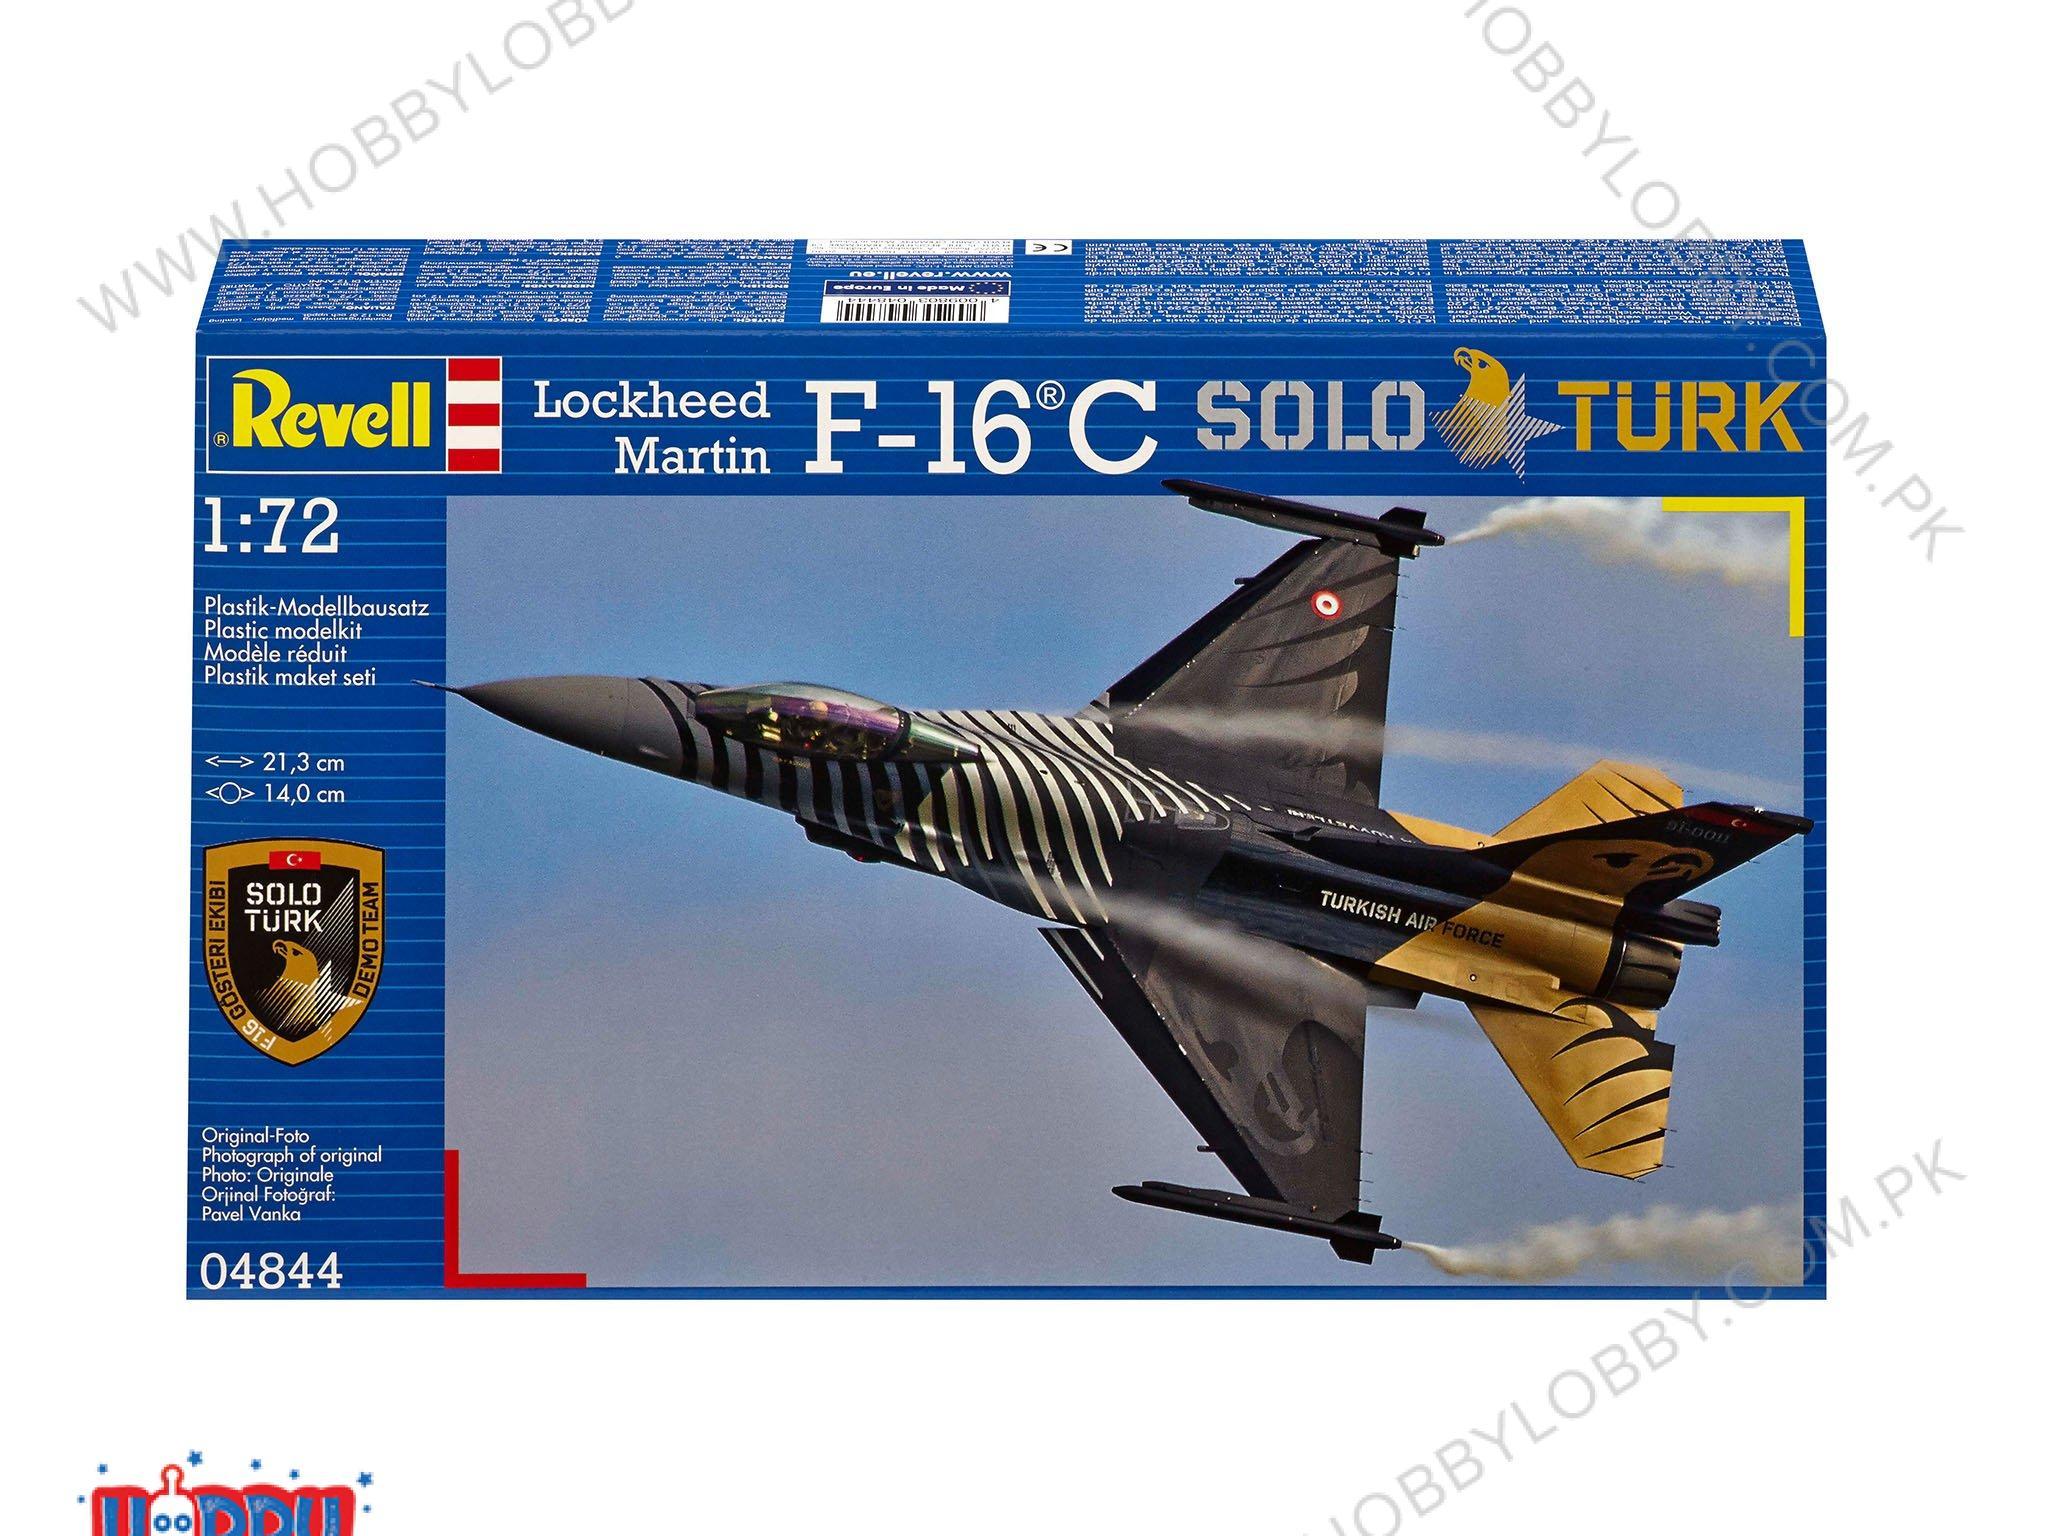 RE 1:72 F-16 C SOLO TURK